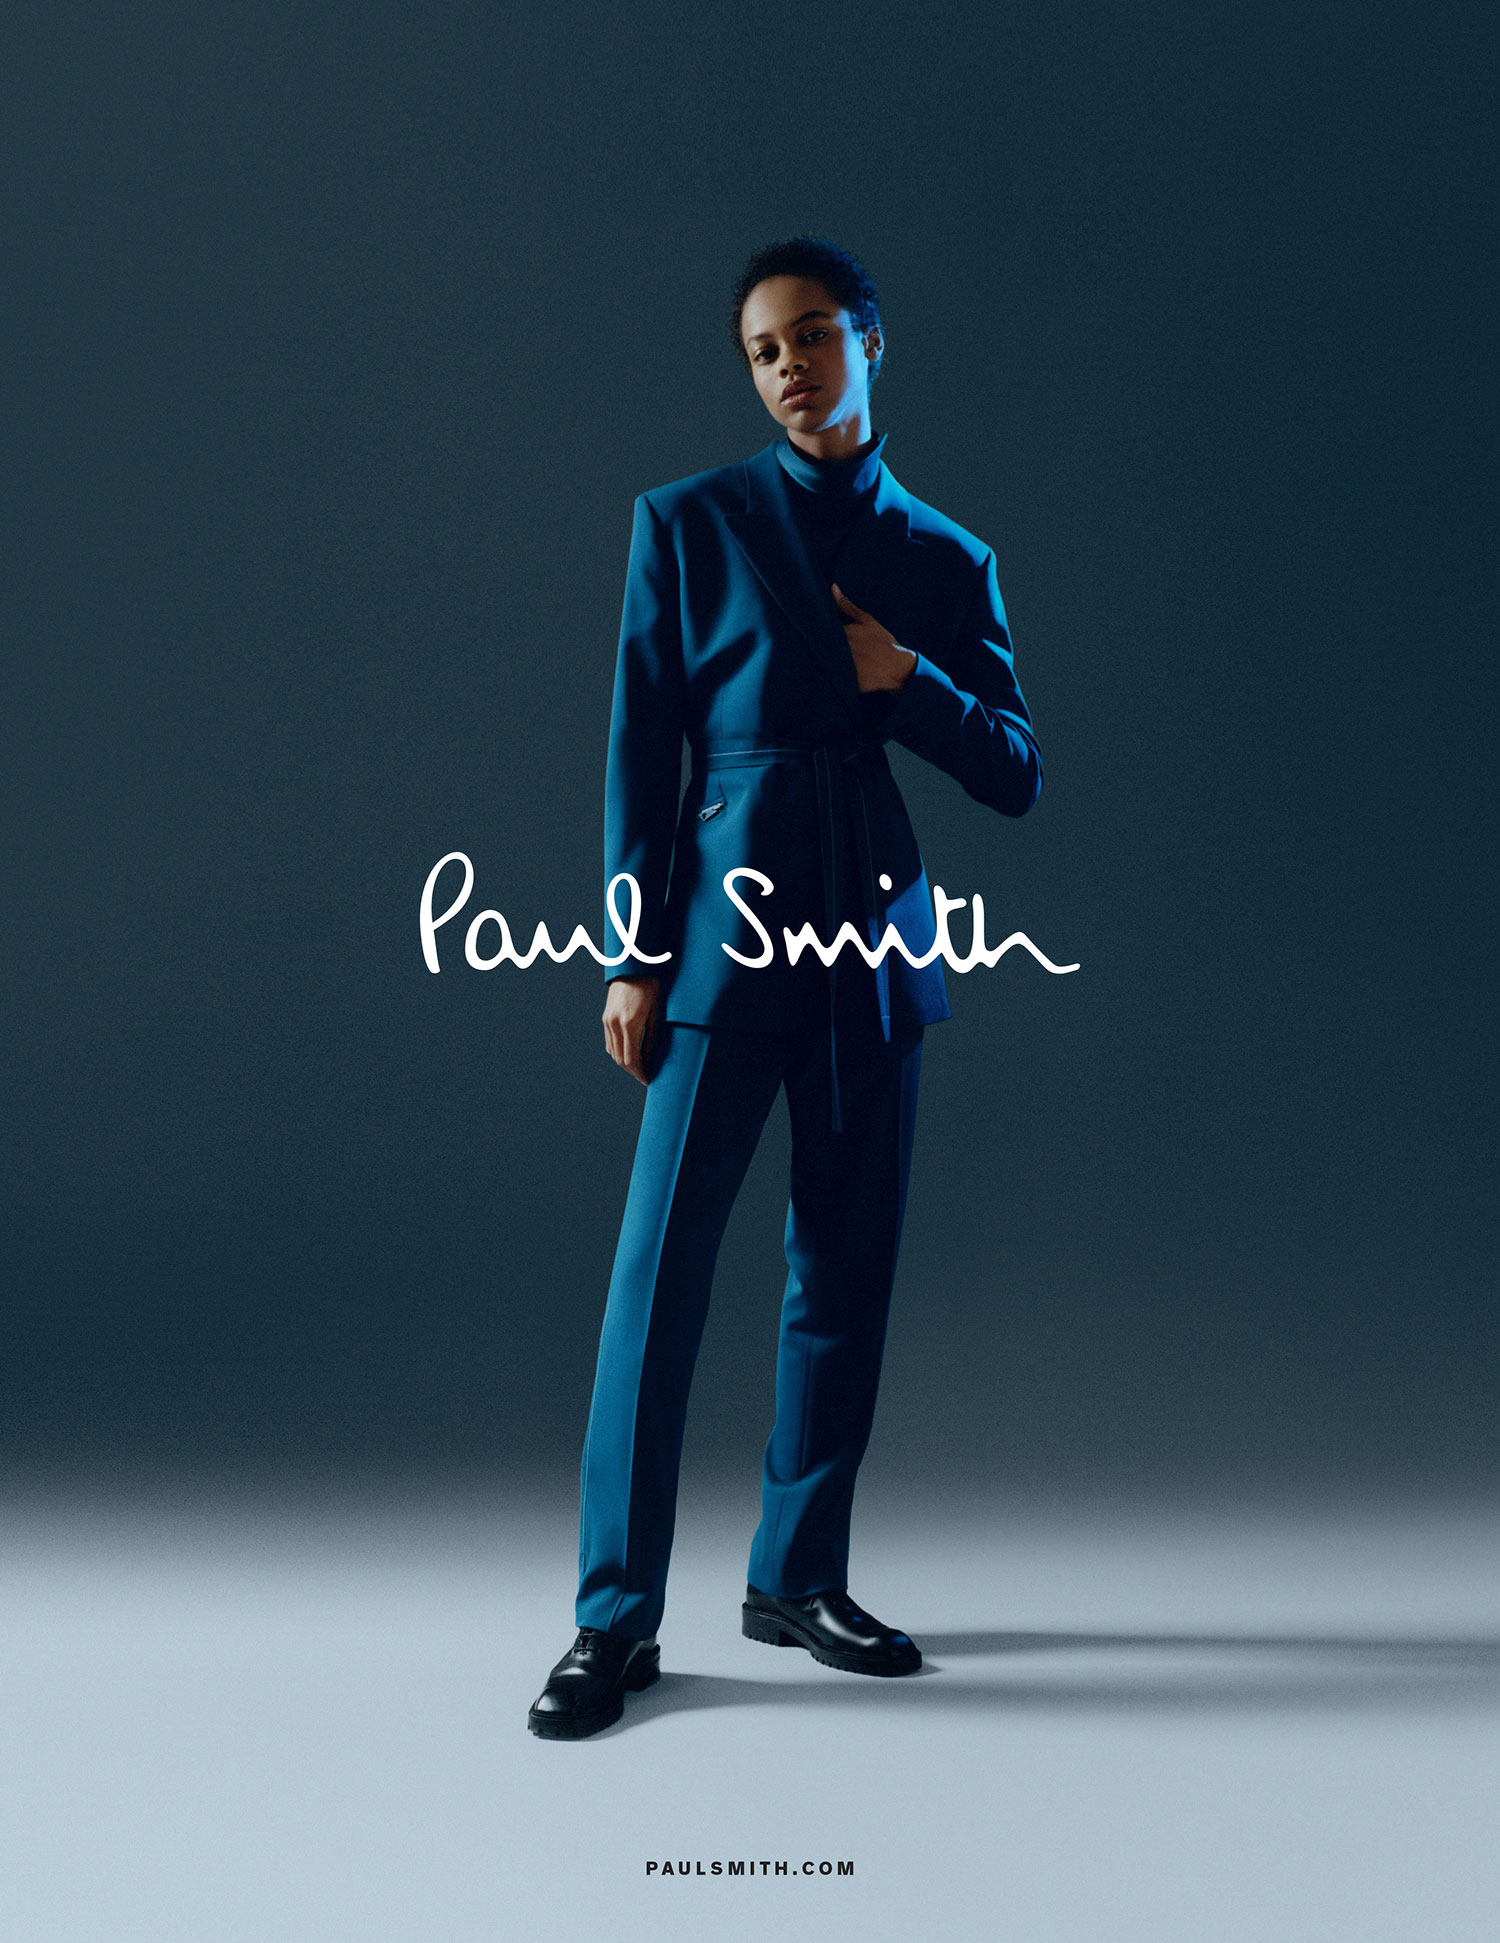 PAUL-SMITH-AW20-CAMPAIGN-BY-GREG-LIN-JIAJIE_3